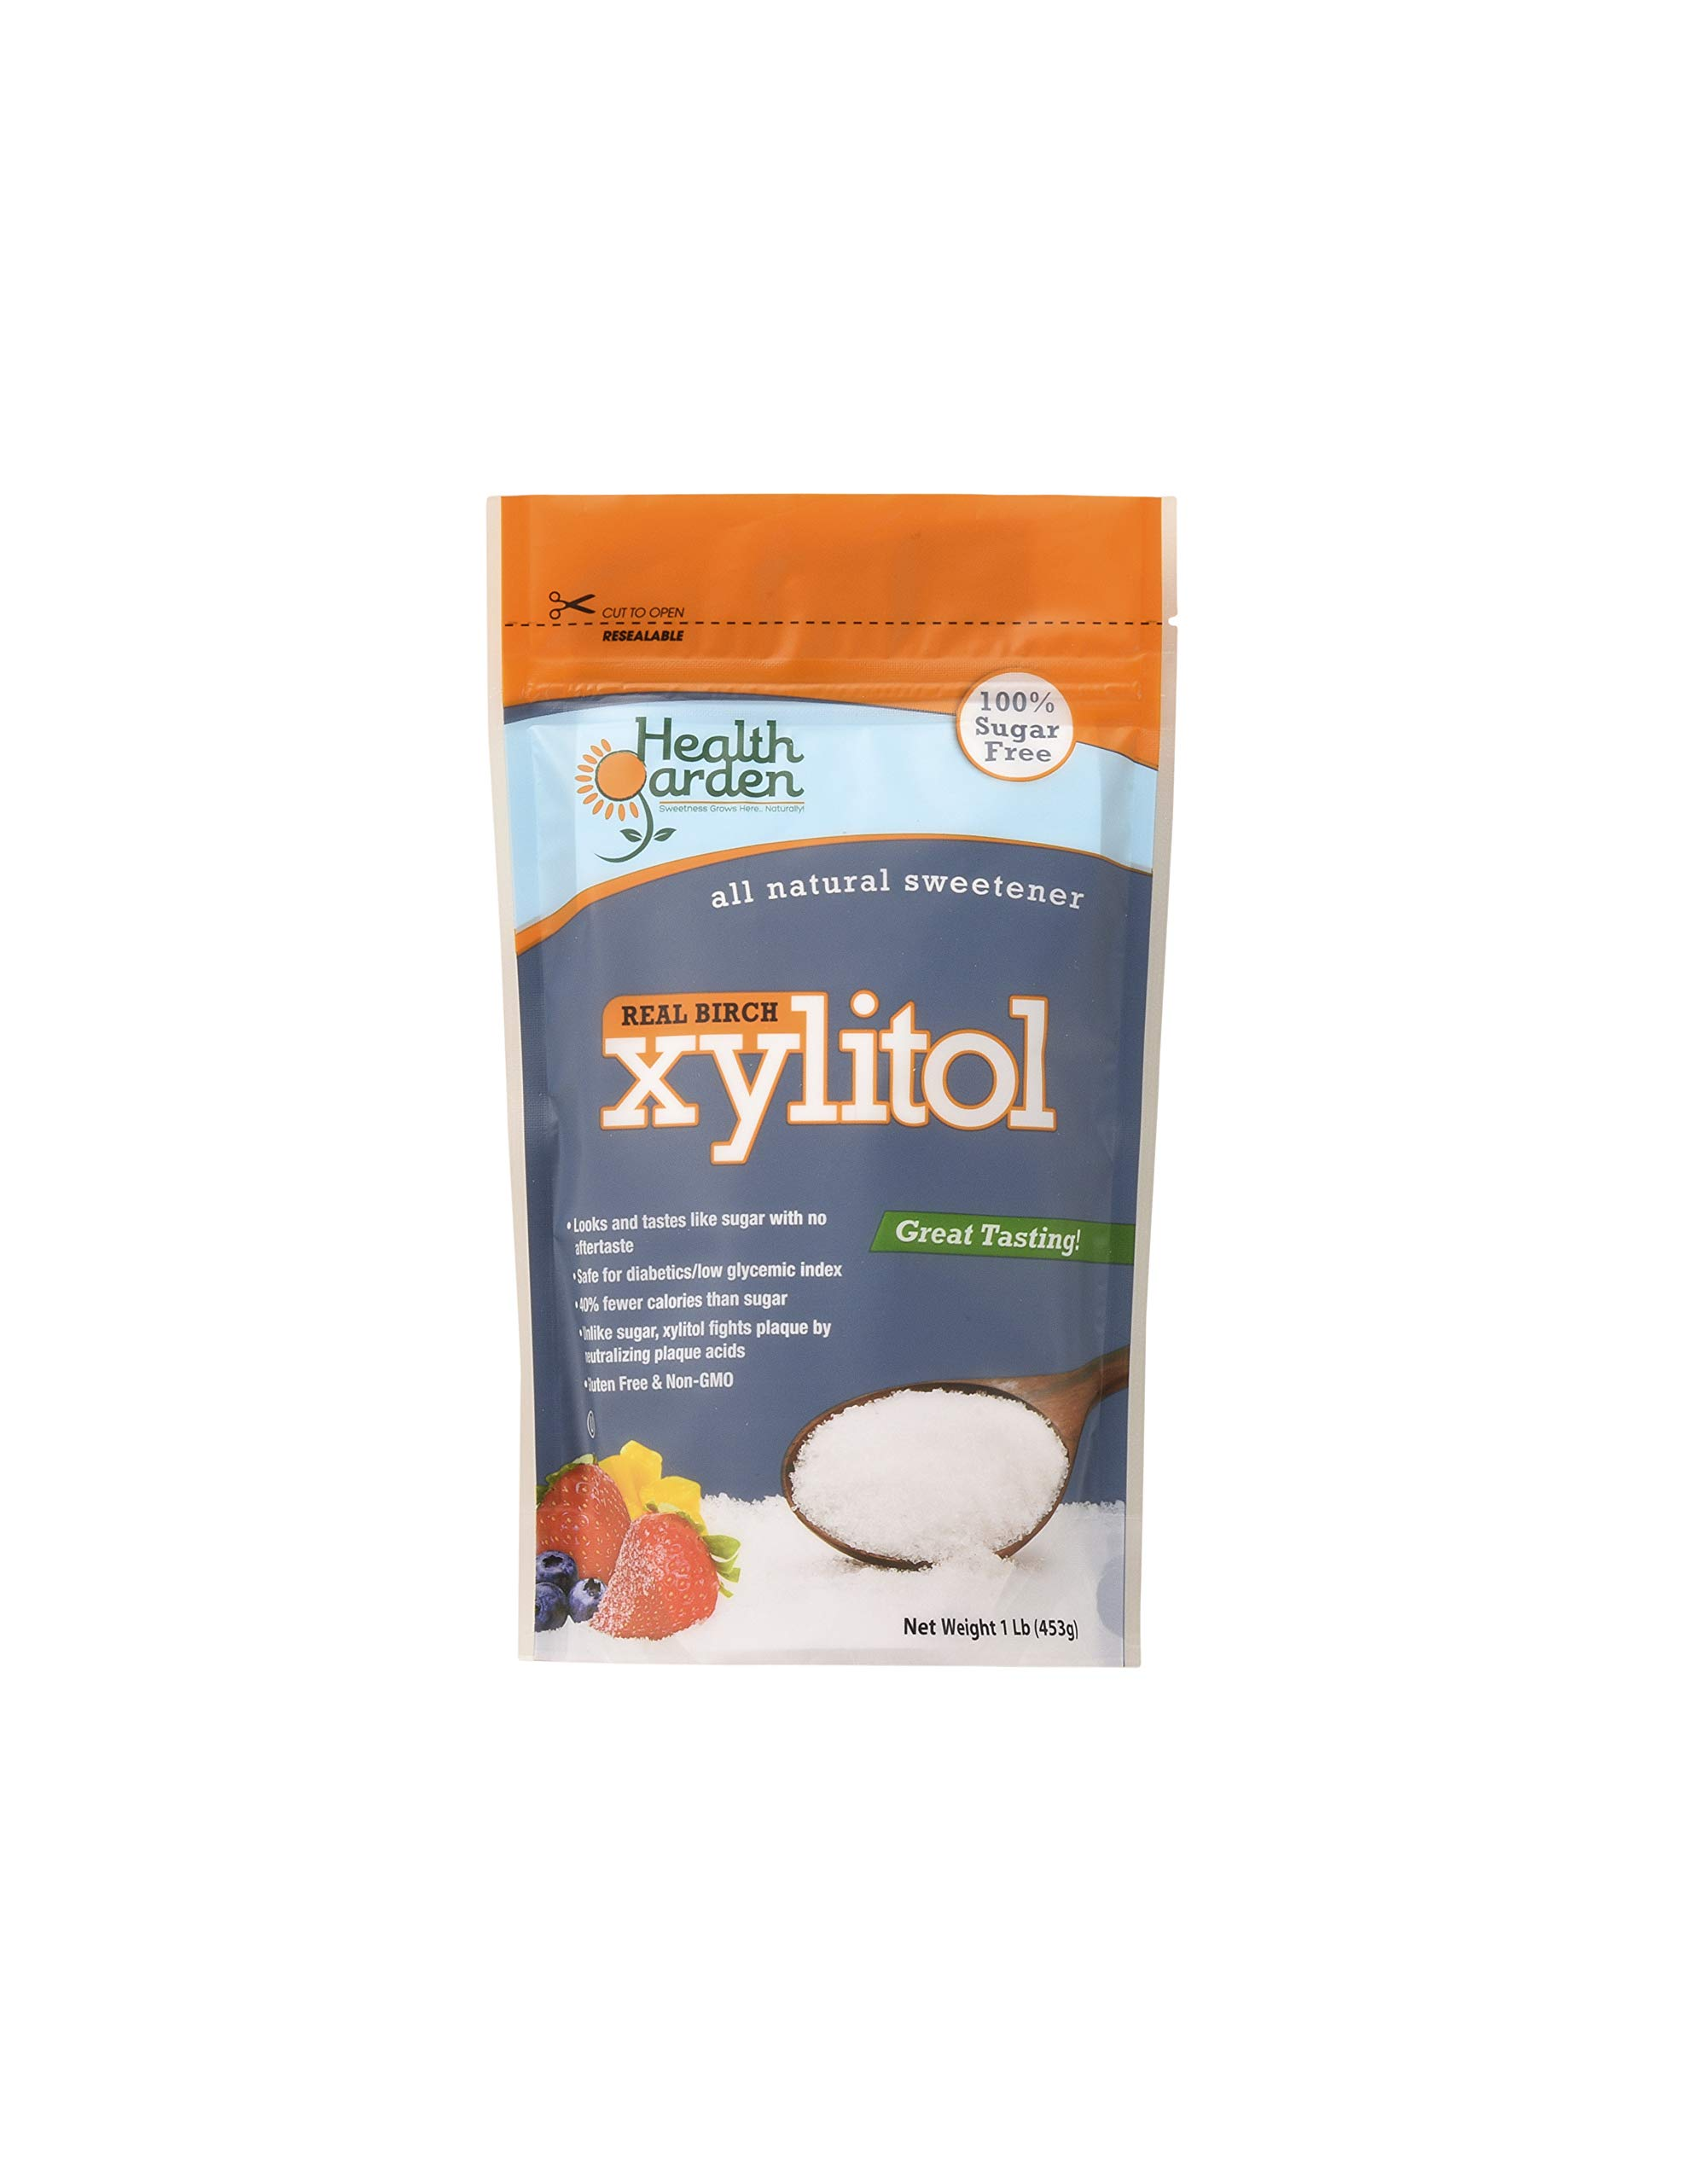 Health Garden Birch Xylitol Sugar Free Sweetener, All Natural Non GMO, Not from Corn